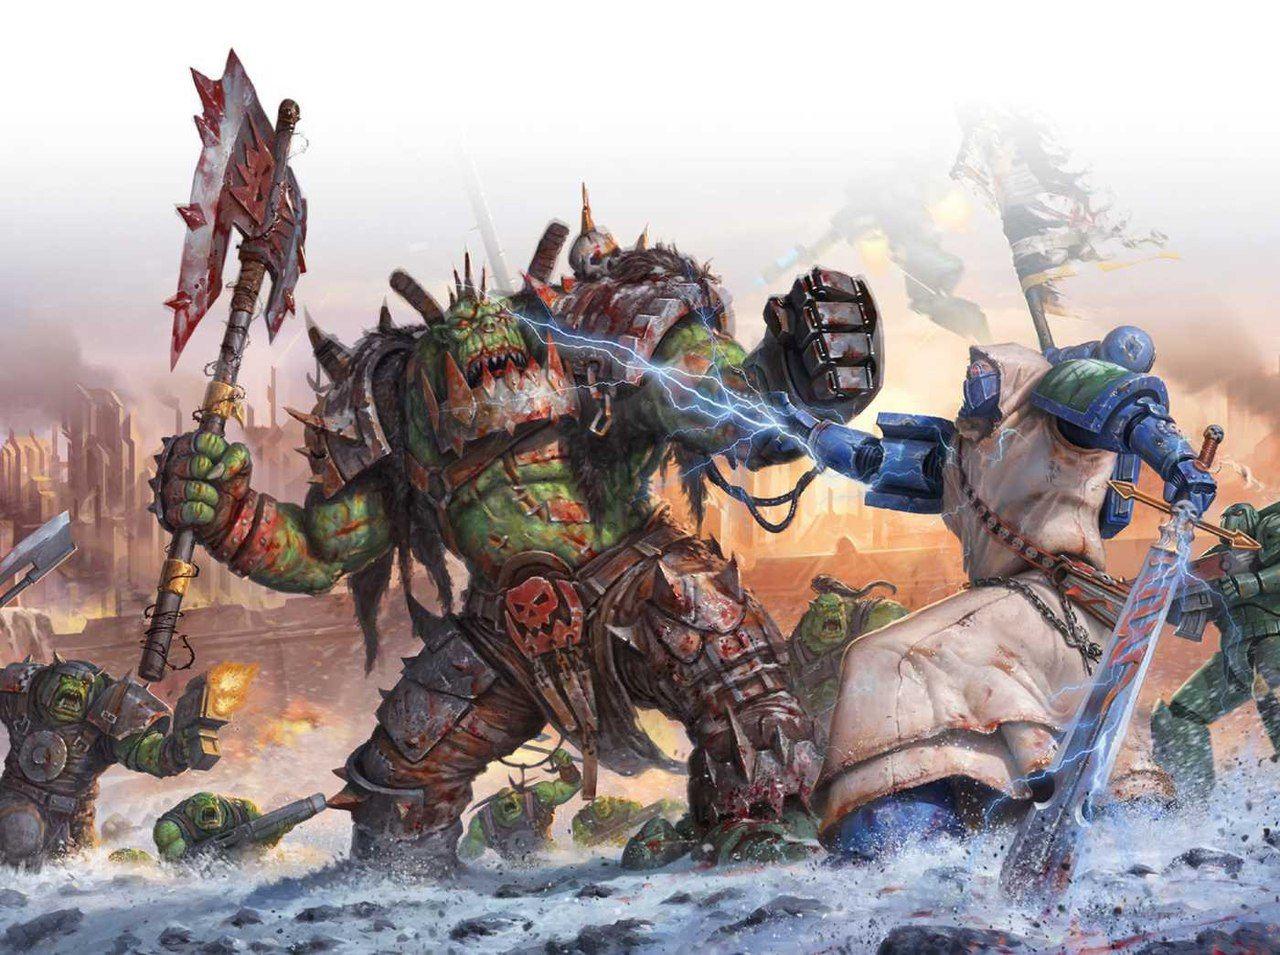 Warhammer 40k & AoS: Art of War's photos – 103 albums | VK